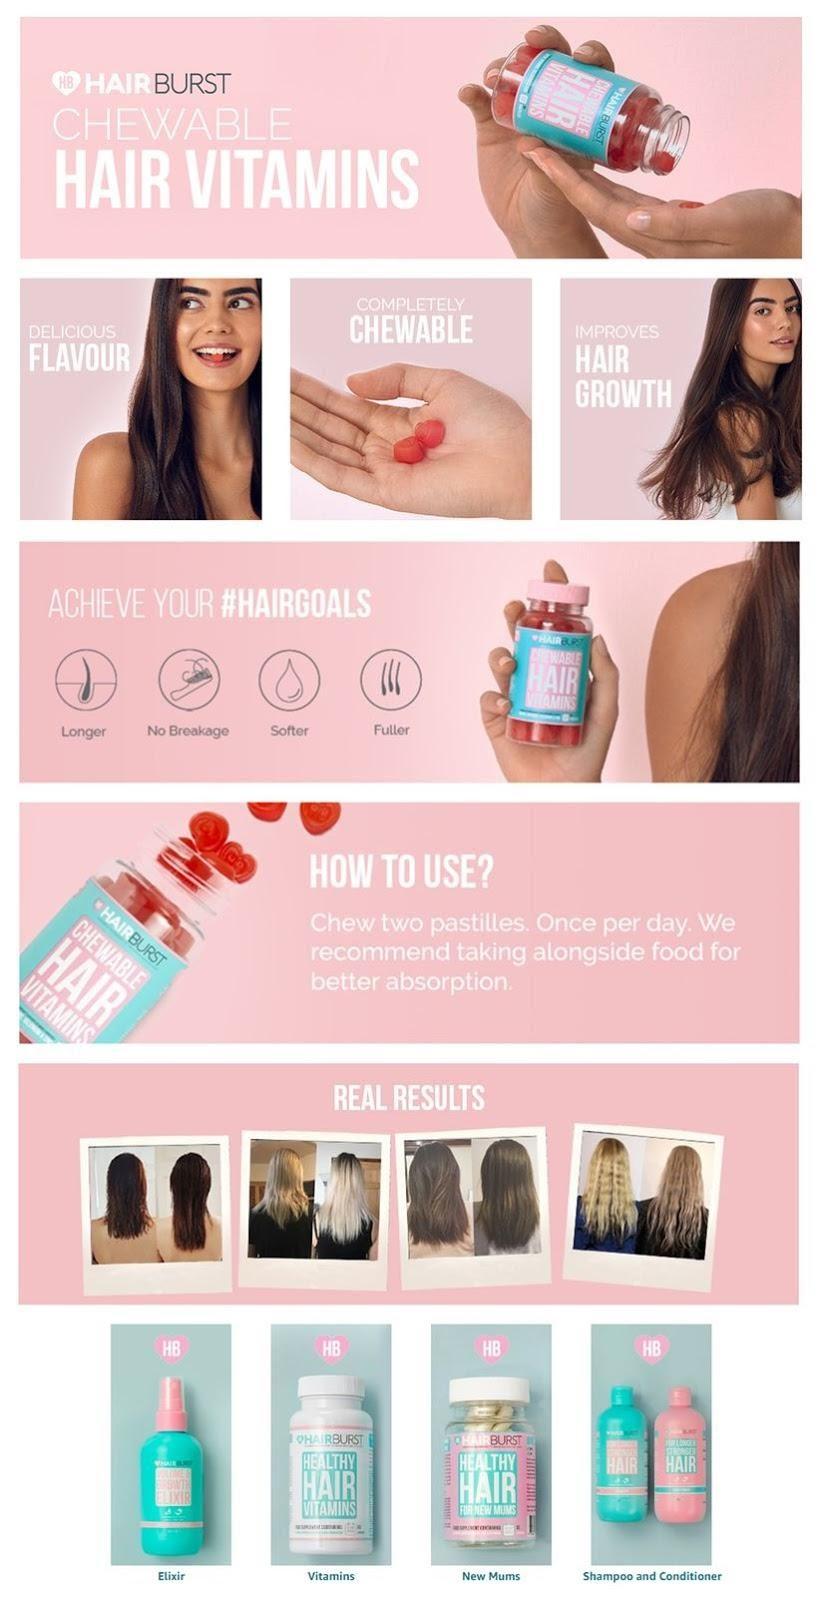 Hairburst Product Description Amazon Listing Optimization